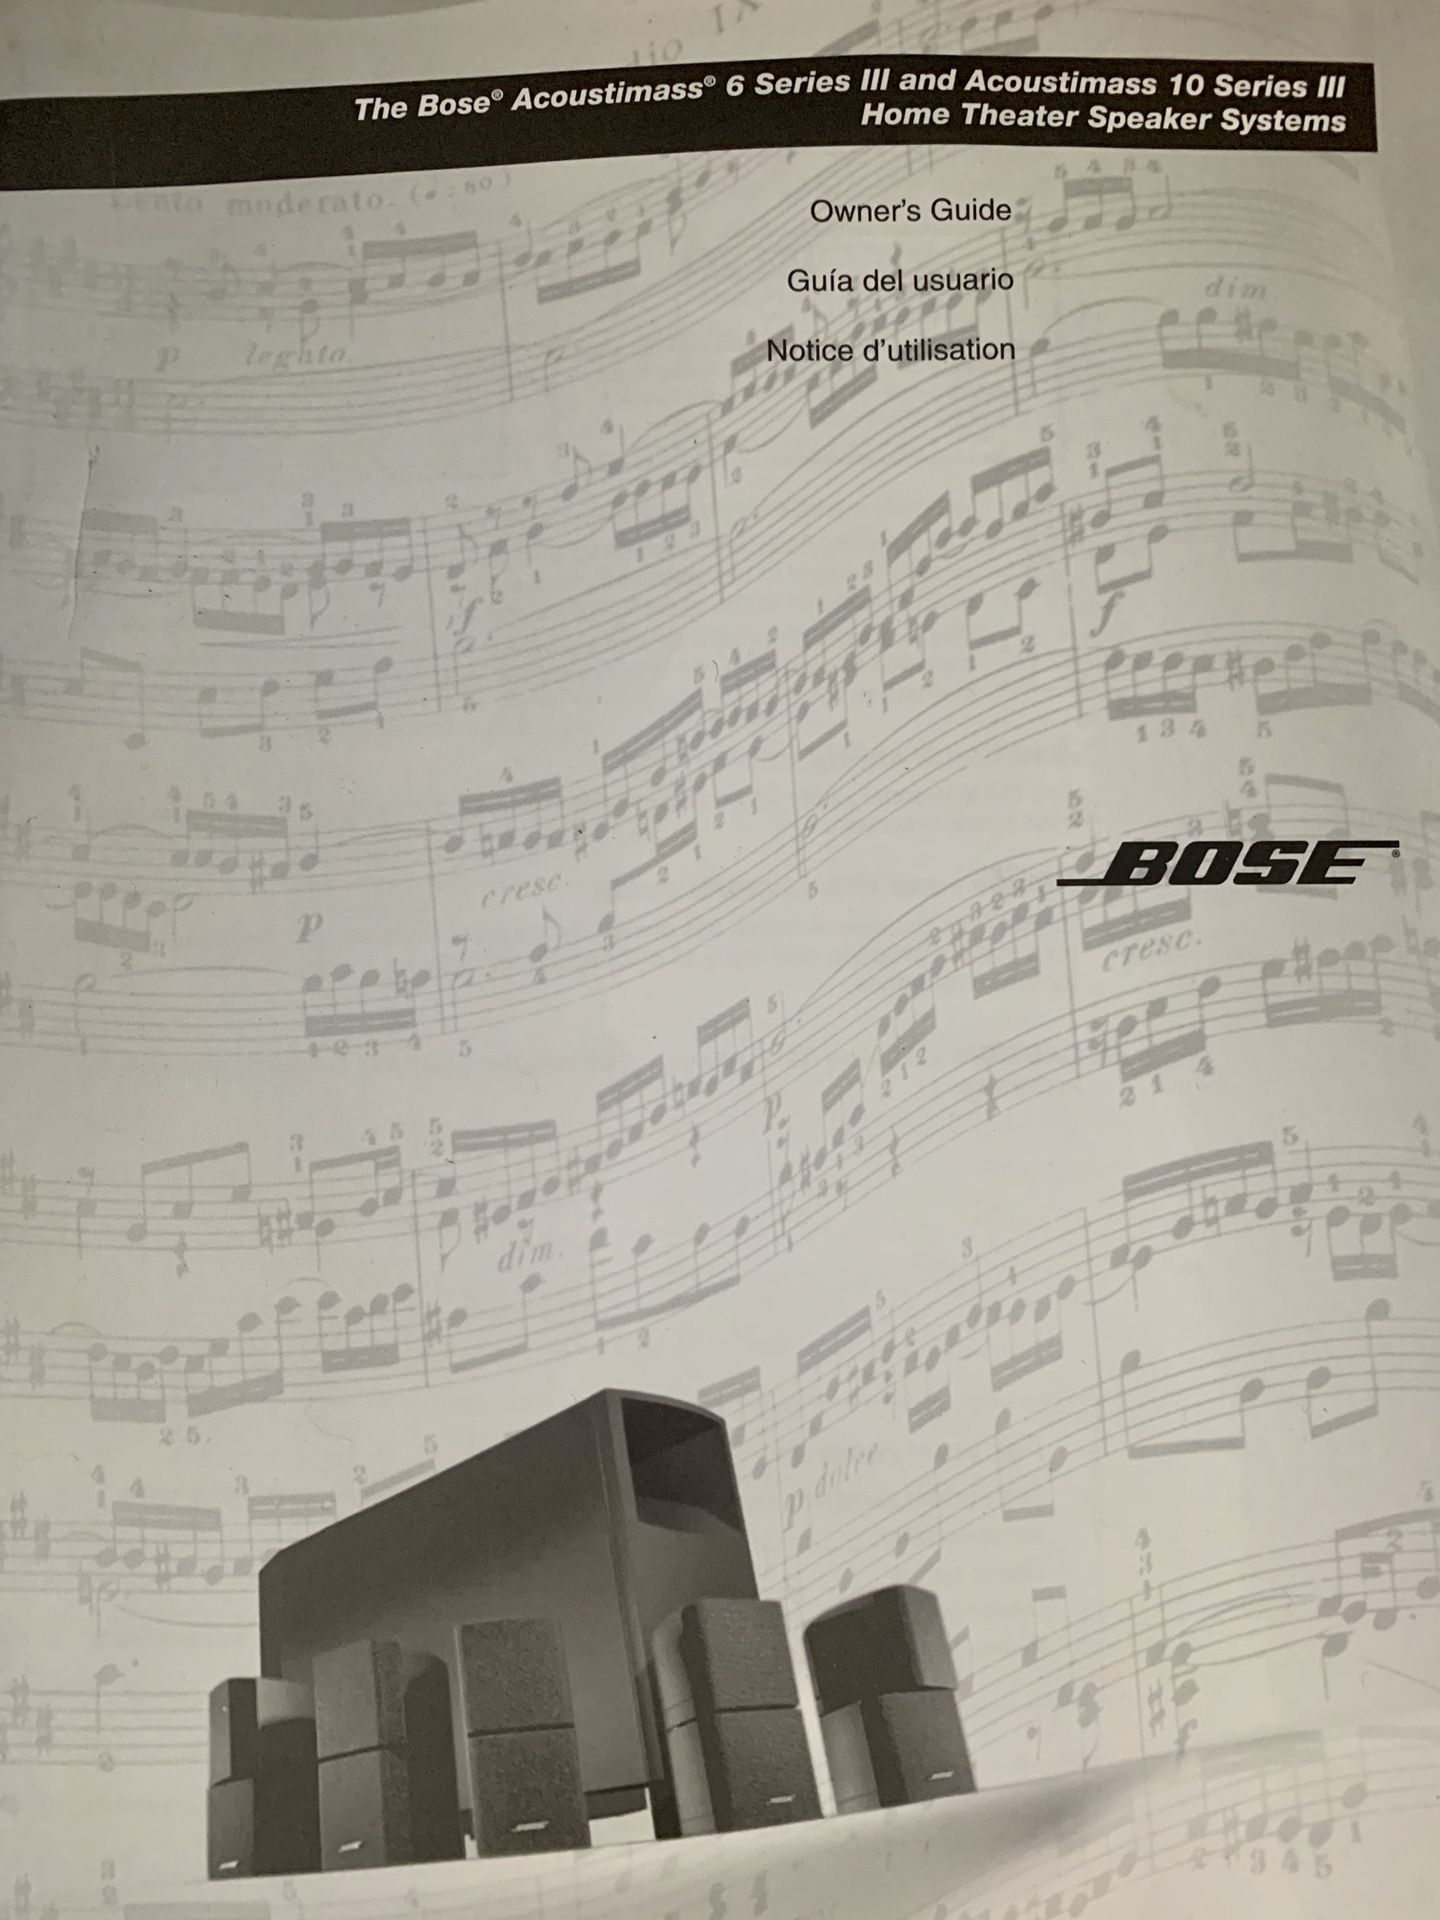 Bose Acoustimass 10 Series & Pioneer Elite Receiver